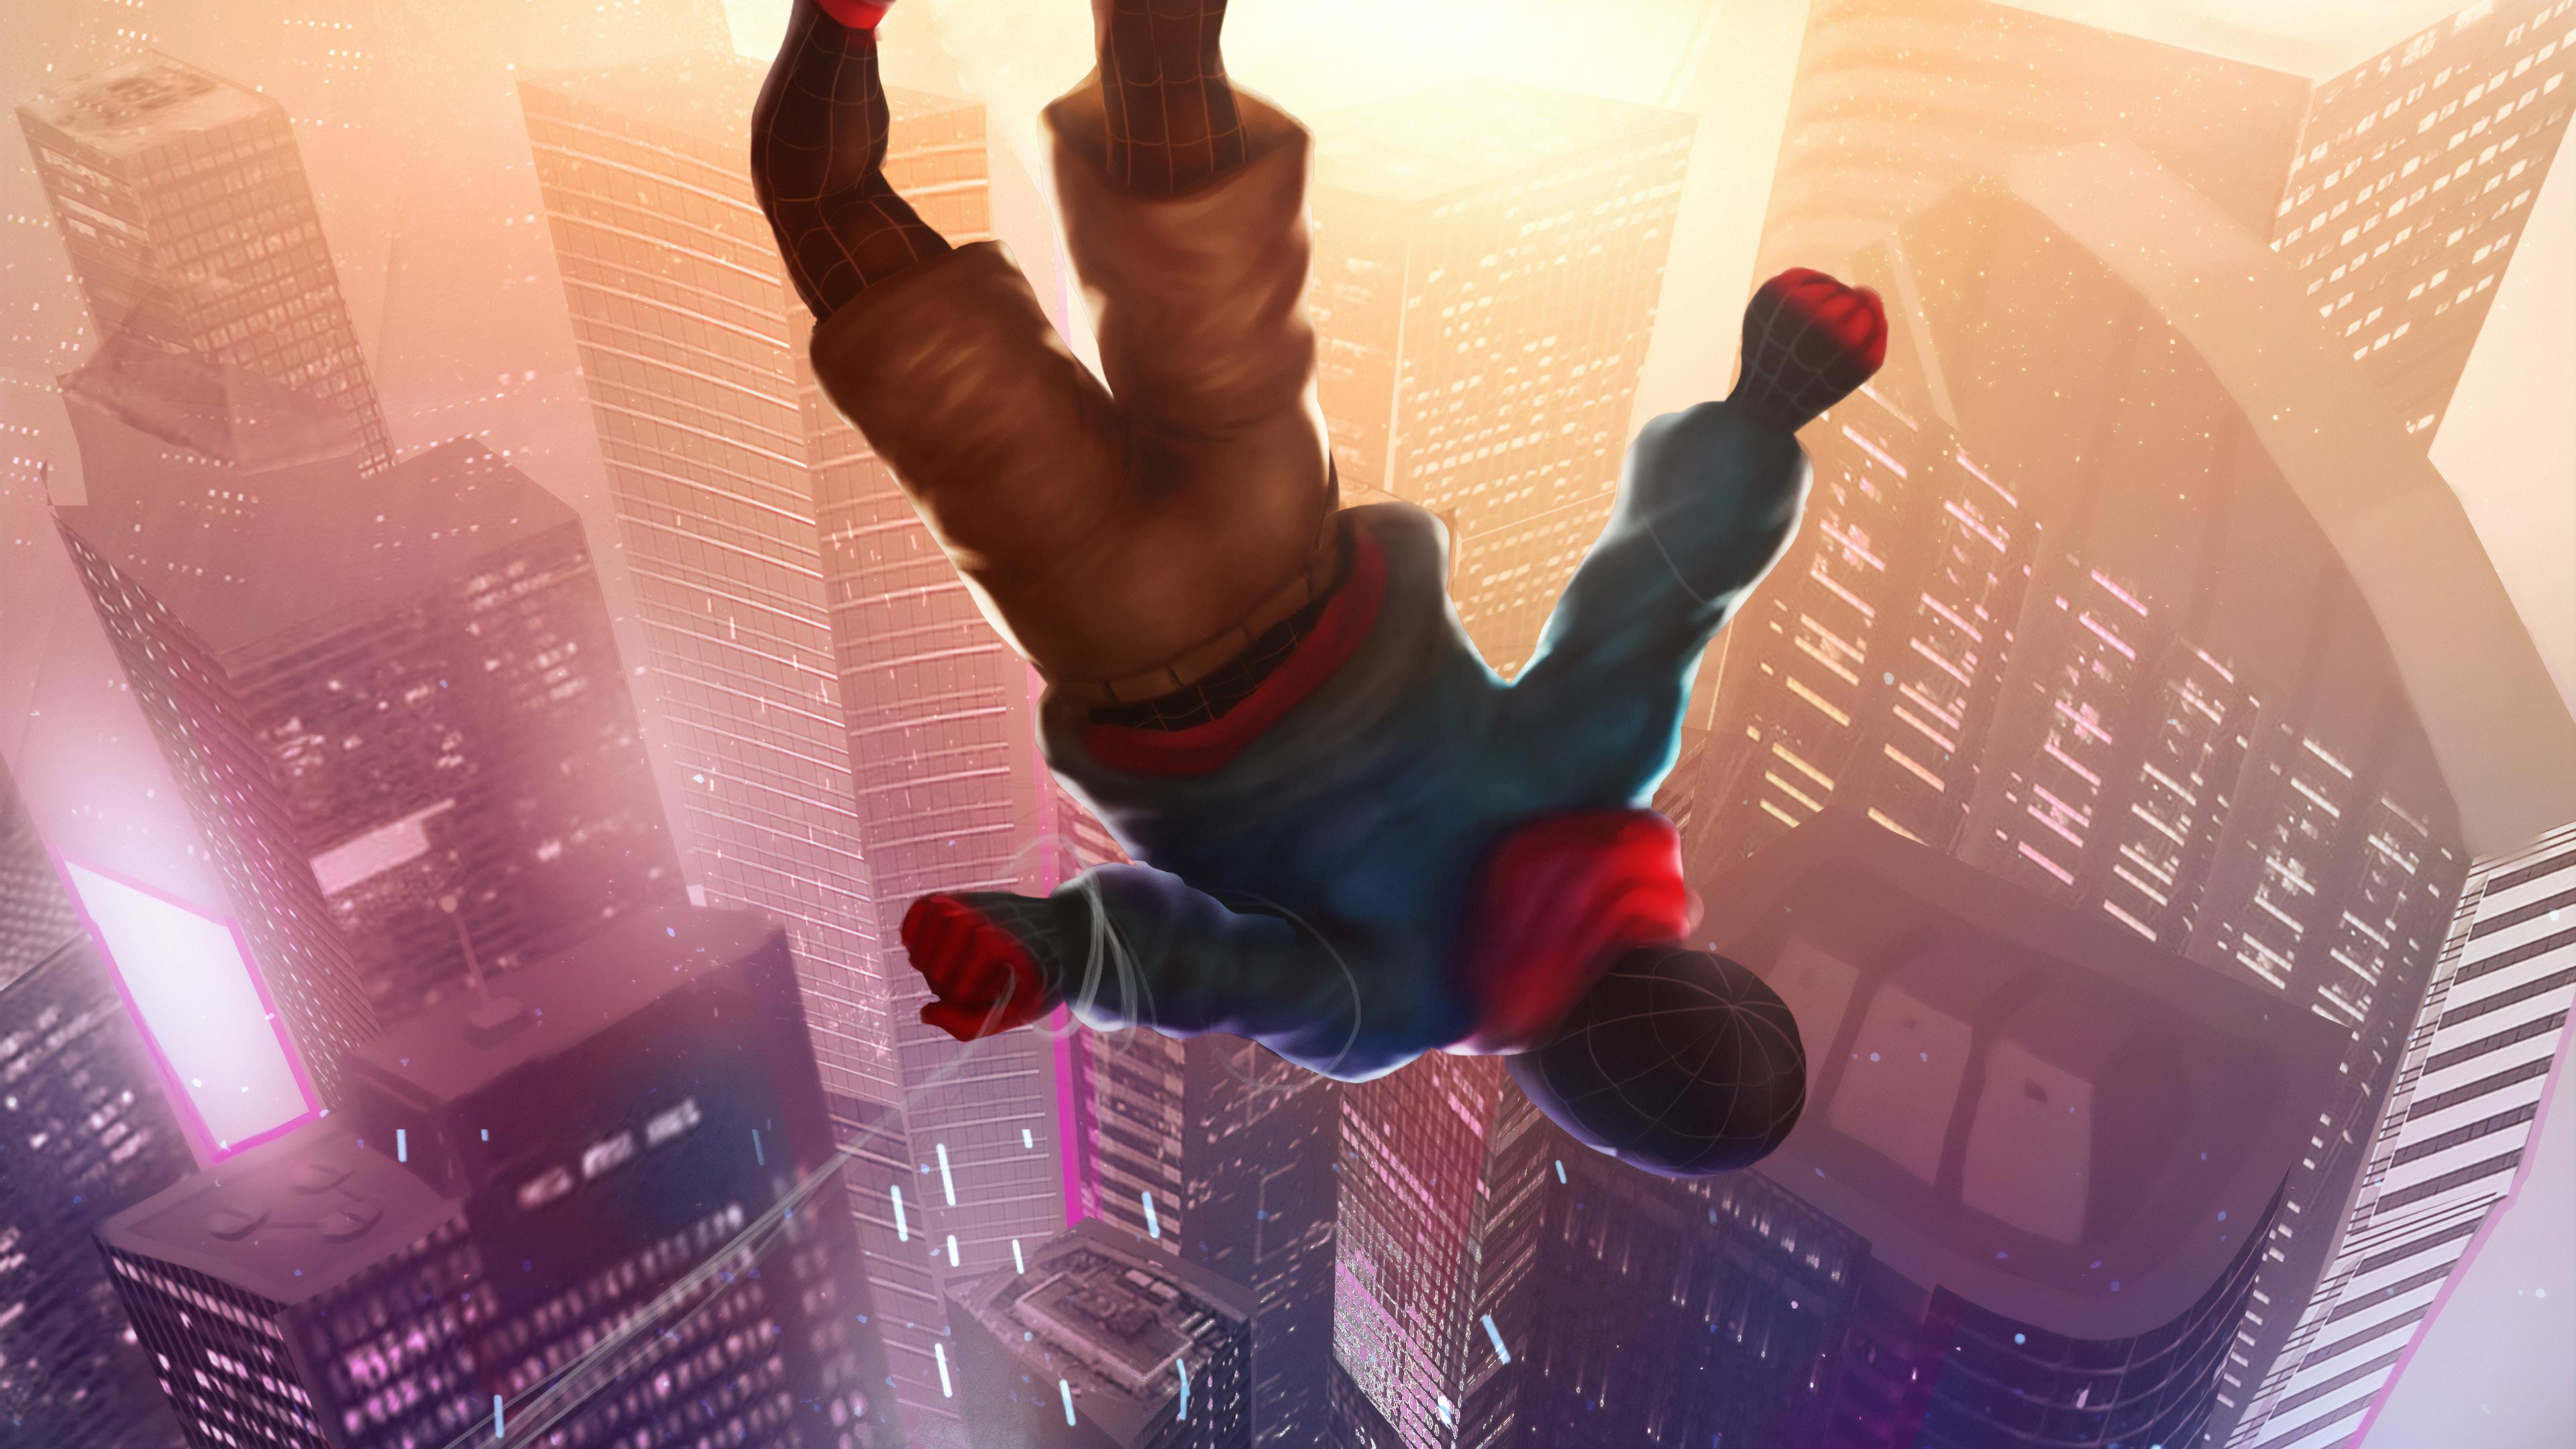 spiderman falling 1565053244 - Spiderman Falling - superheroes wallpapers, spiderman wallpapers, hd-wallpapers, digital art wallpapers, artwork wallpapers, art wallpapers, 4k-wallpapers